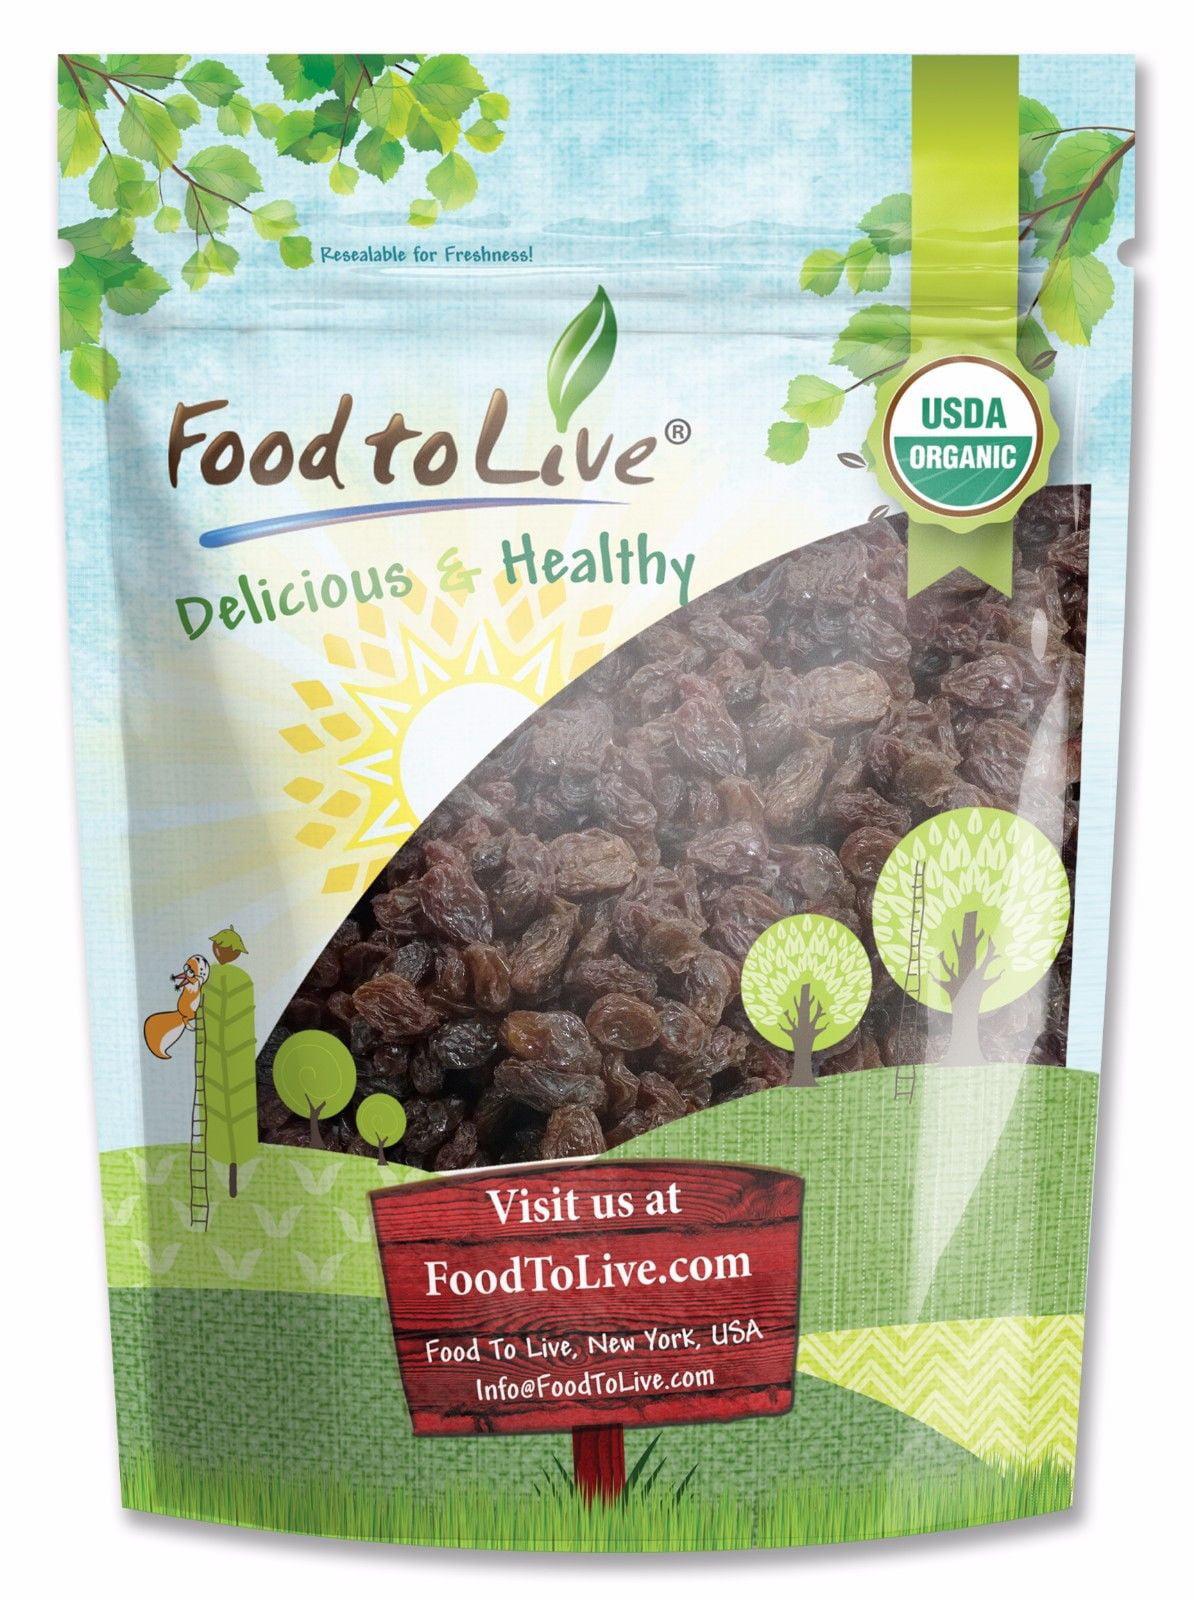 Food To Live ® Organic California Thompson Seedless Raisins (Sun-Dried, Non-GMO, Unsulphured, Bulk) (1 Pound)